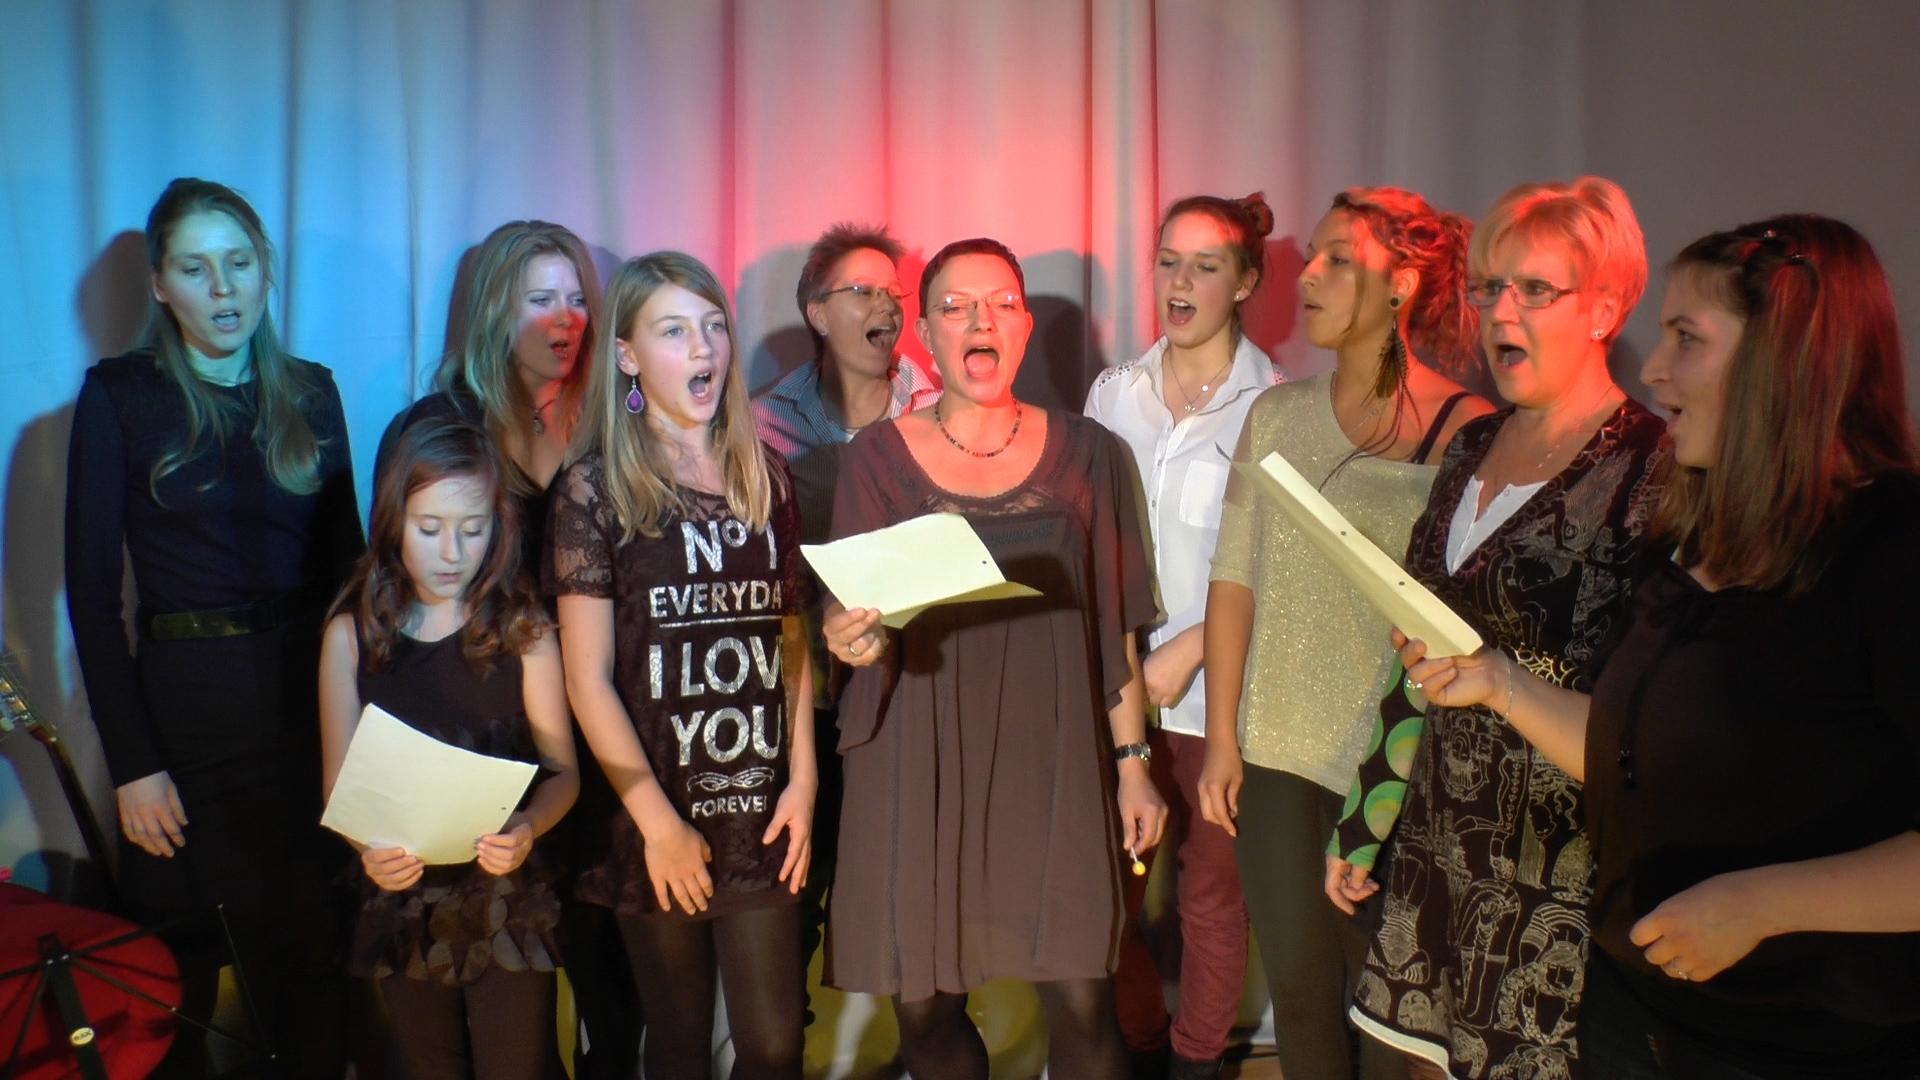 Gesangsworkshops Schülerfoto